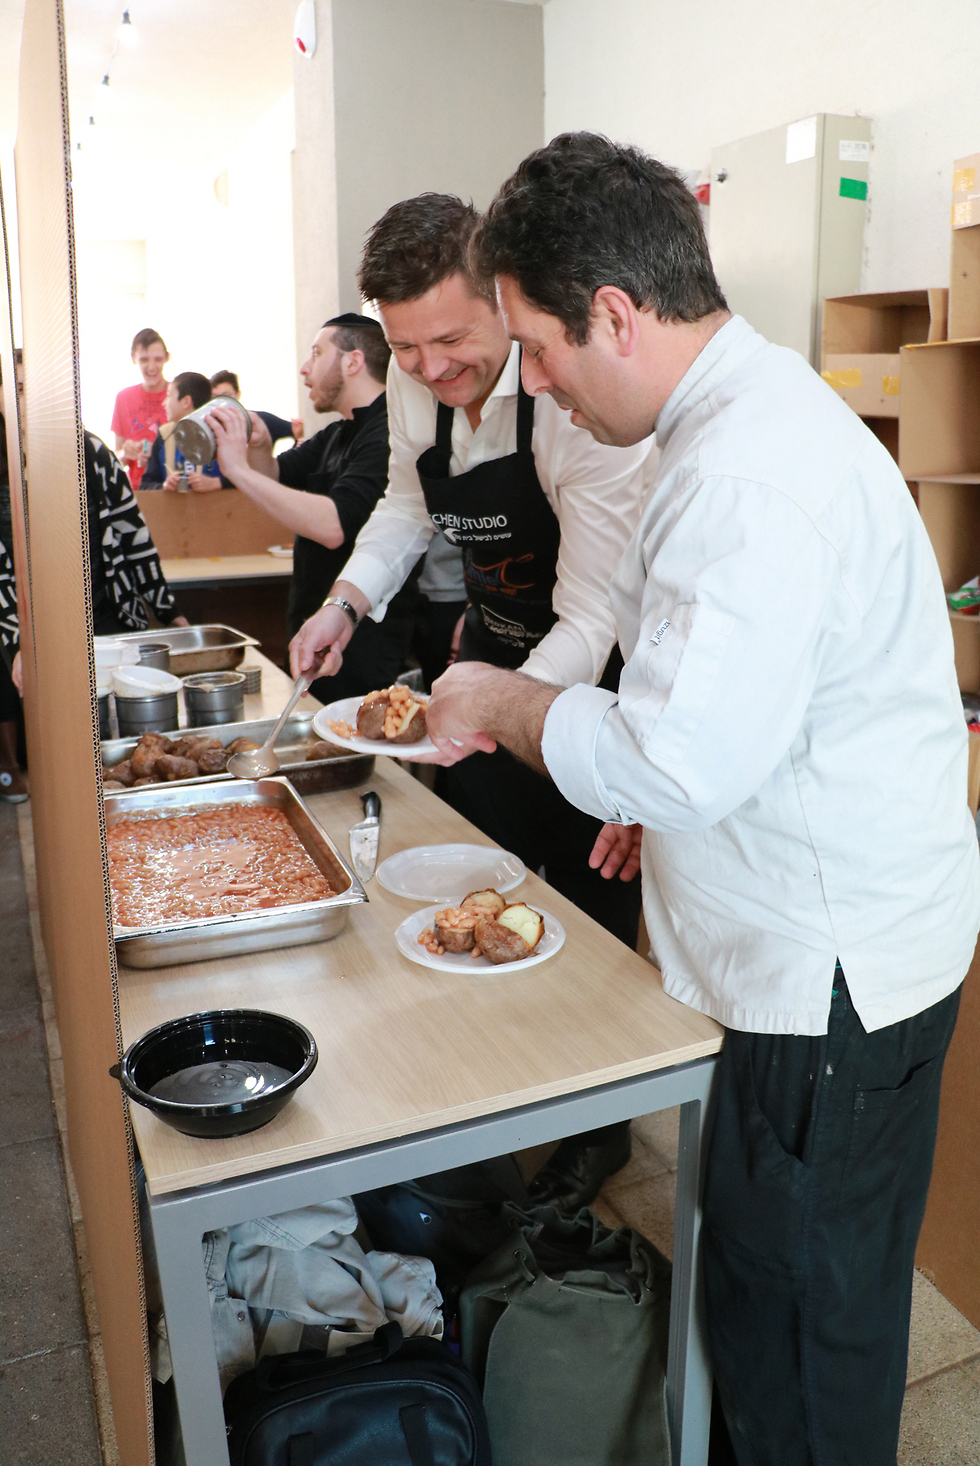 Deputy British Ambassador Tony Kay, left, helps Chef Itai Farkas in the kitchen (Photo: Amnon Hass)